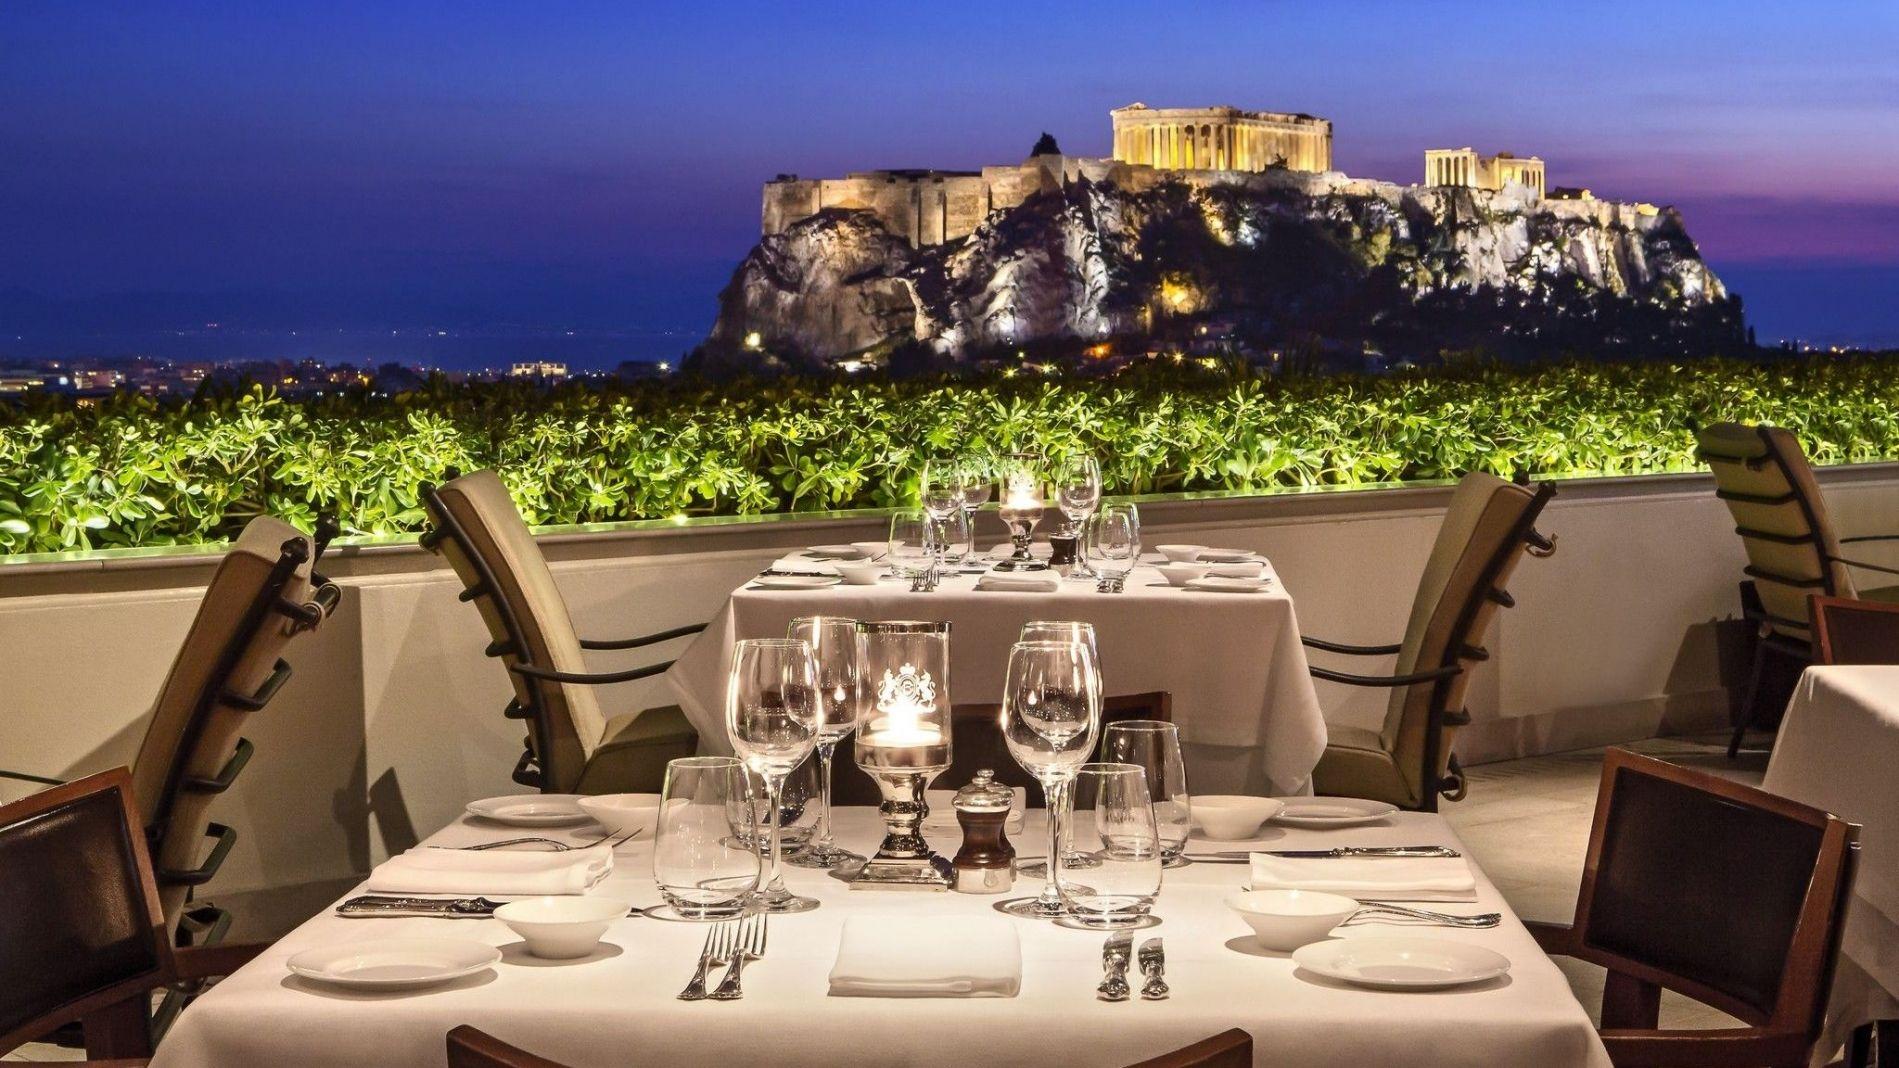 Hotel Grande Bretagne Roof Garden Restaurant